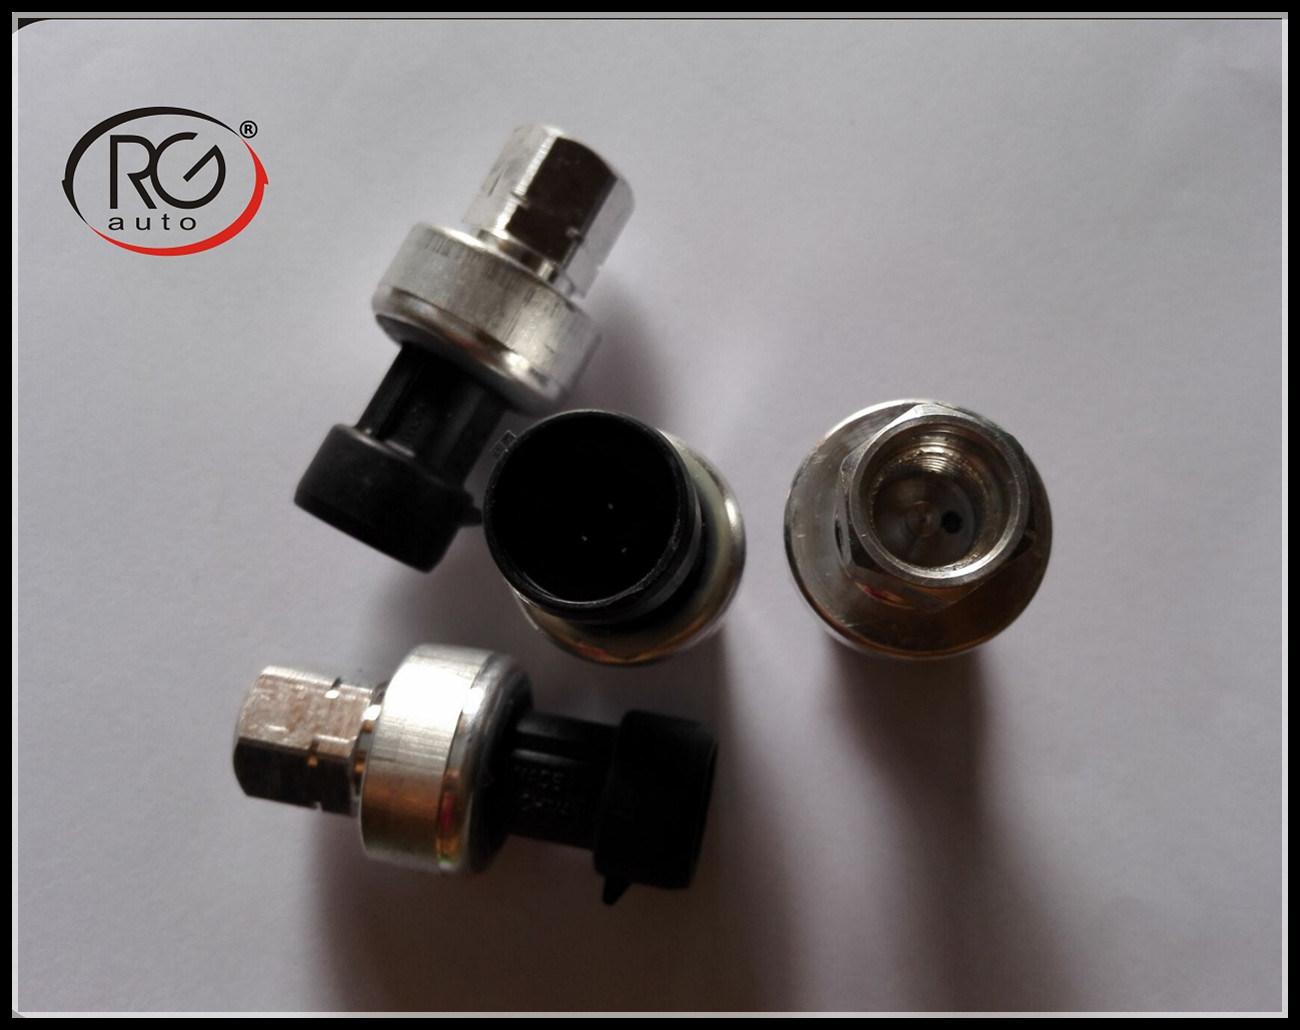 Chevrolet Opel Astra Pressure Switch for Air Conditioning, Pressostato Celta Corsa OE#V40730008 509485 38937 6zl35102